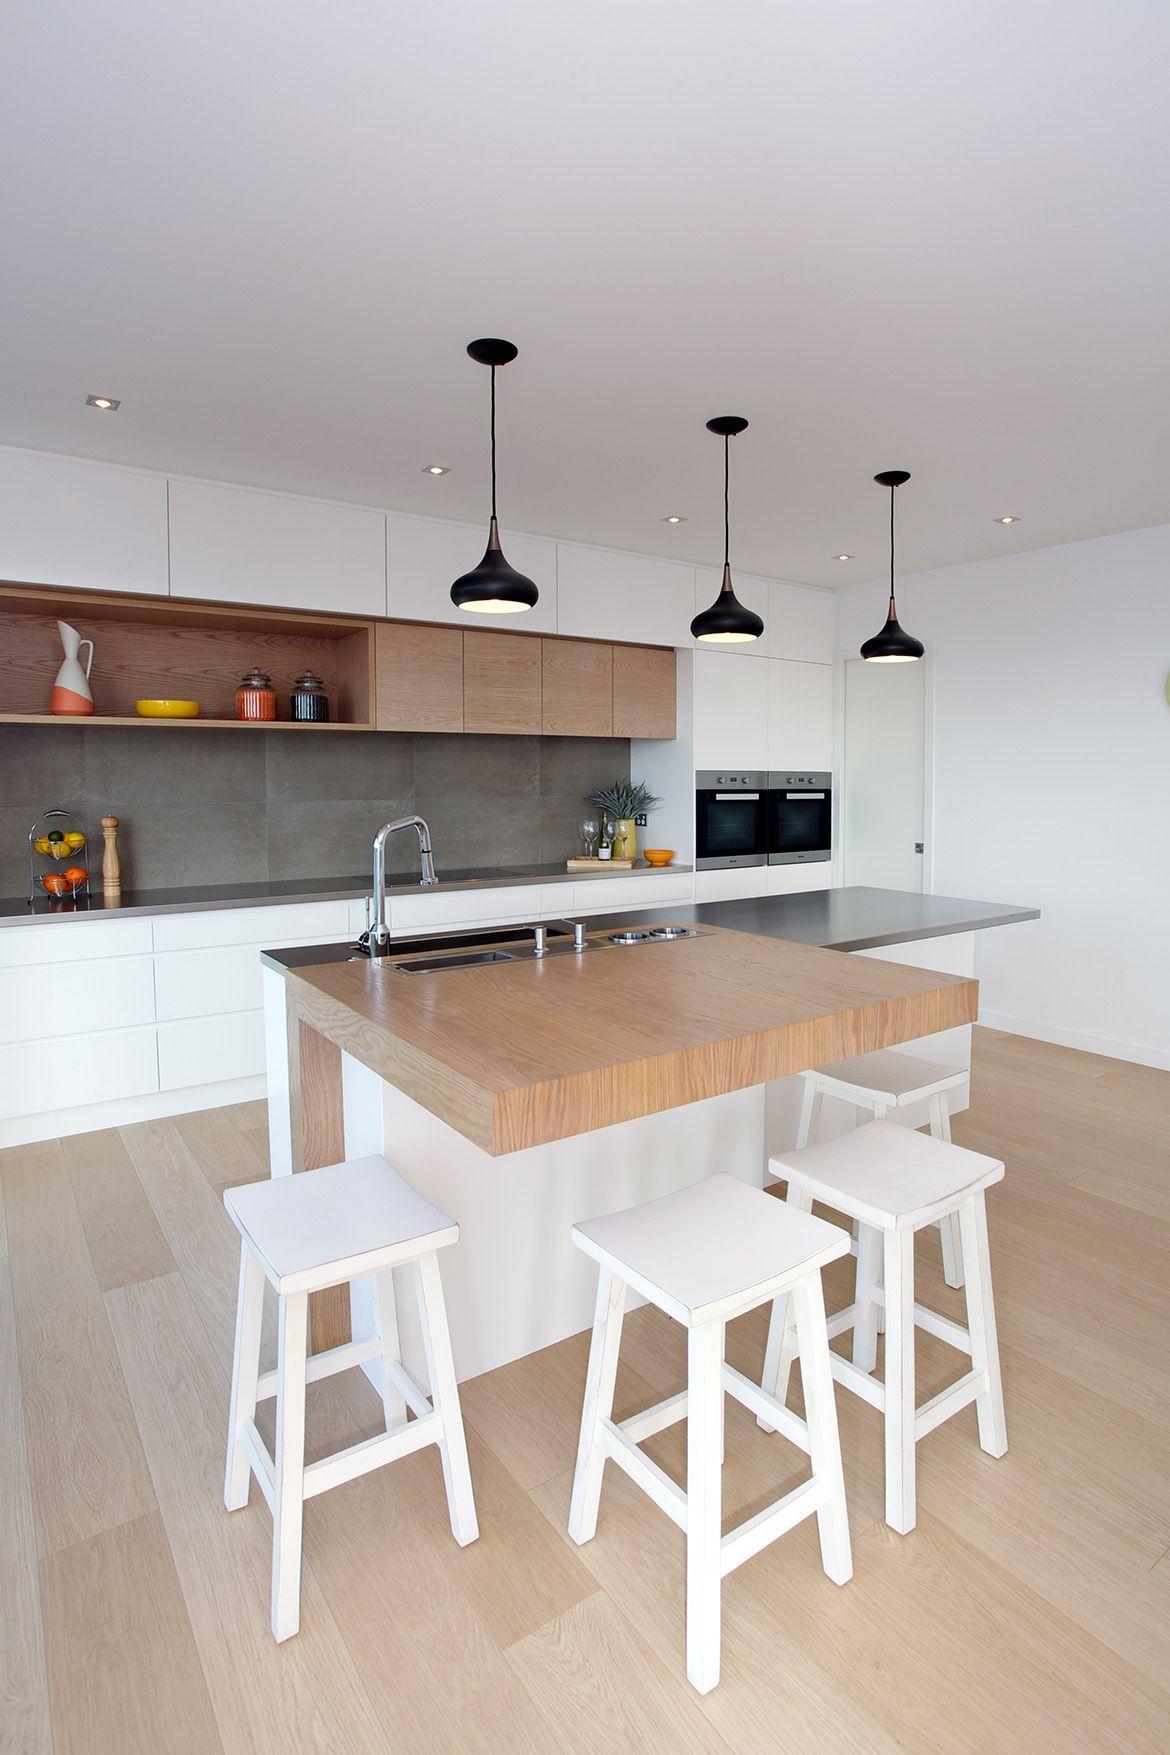 Breakfast Bar with Wood Finish Kitchen Design Ideas